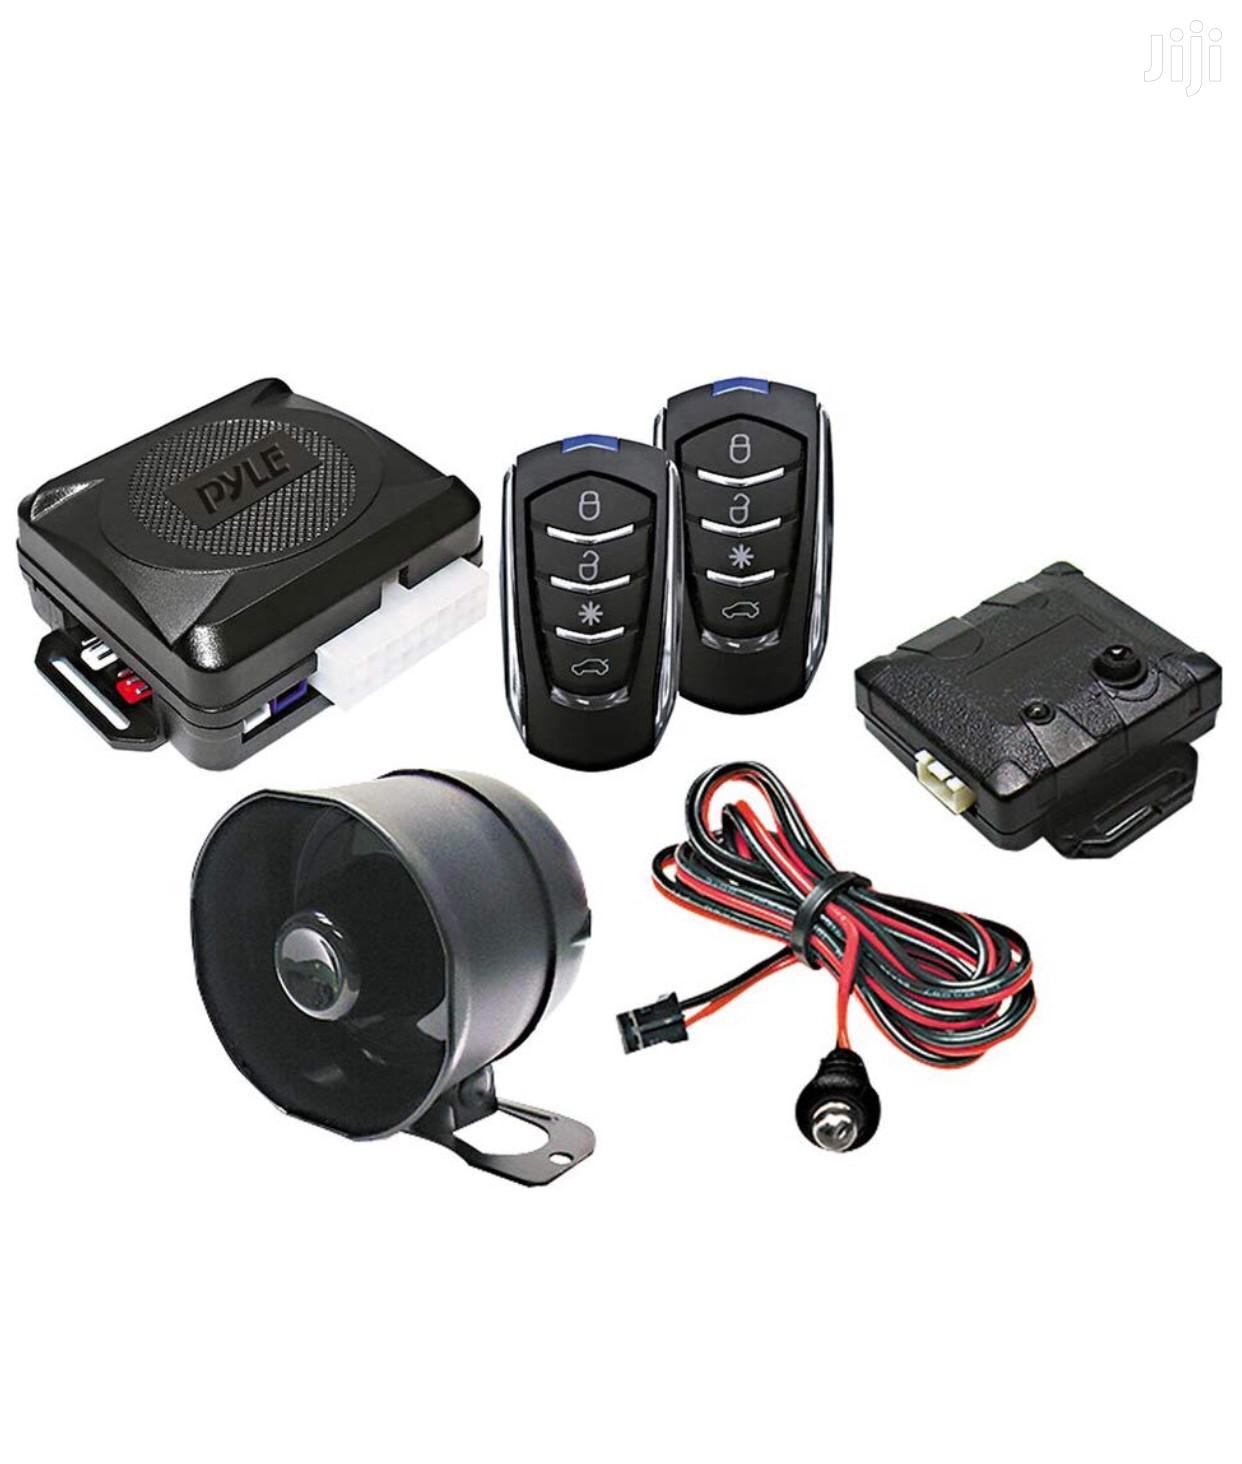 Pyle Car Security Alarm System